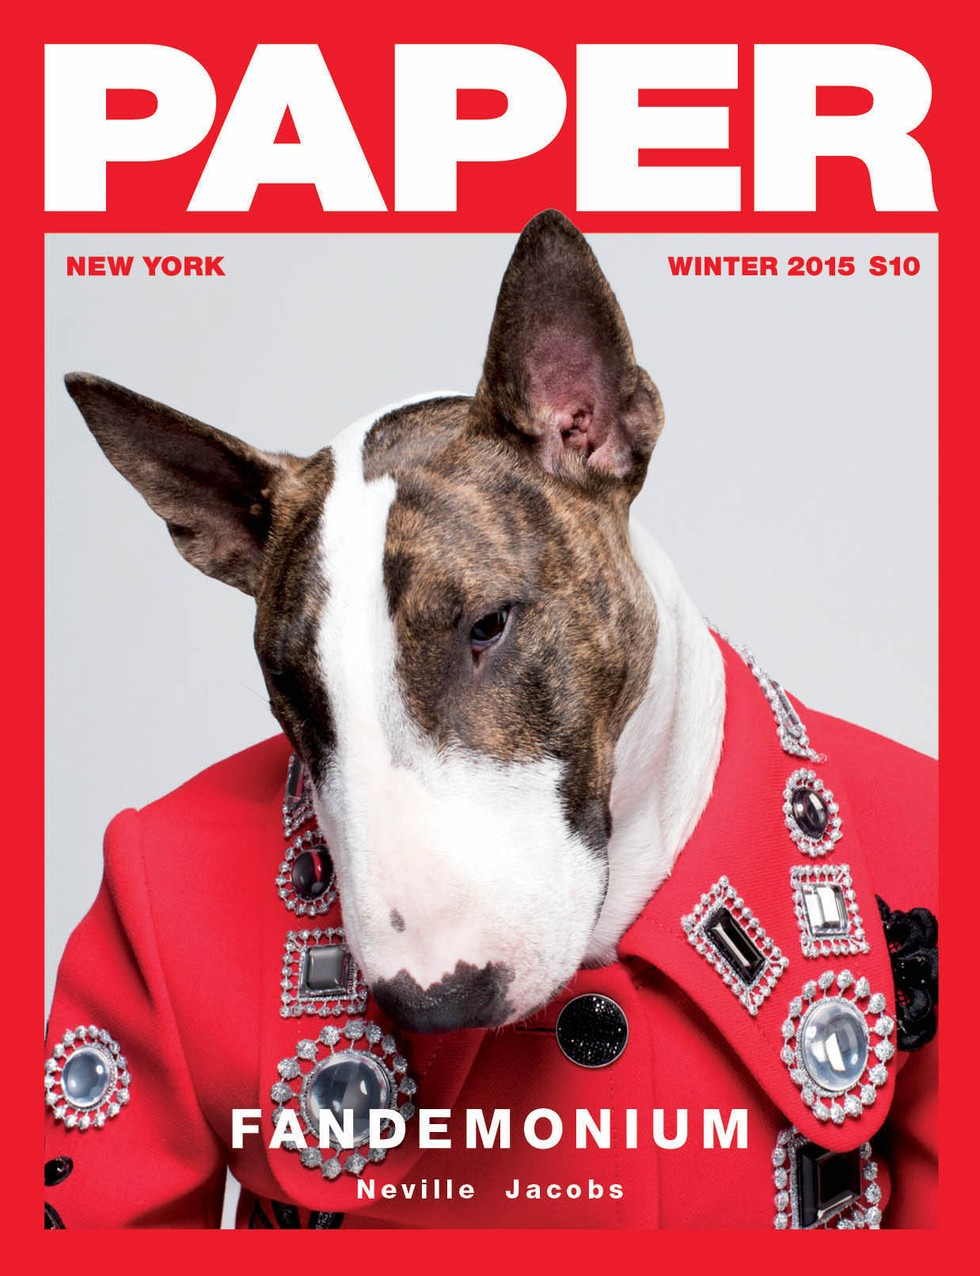 Paper Magazine's Fandemonium Cover Stars